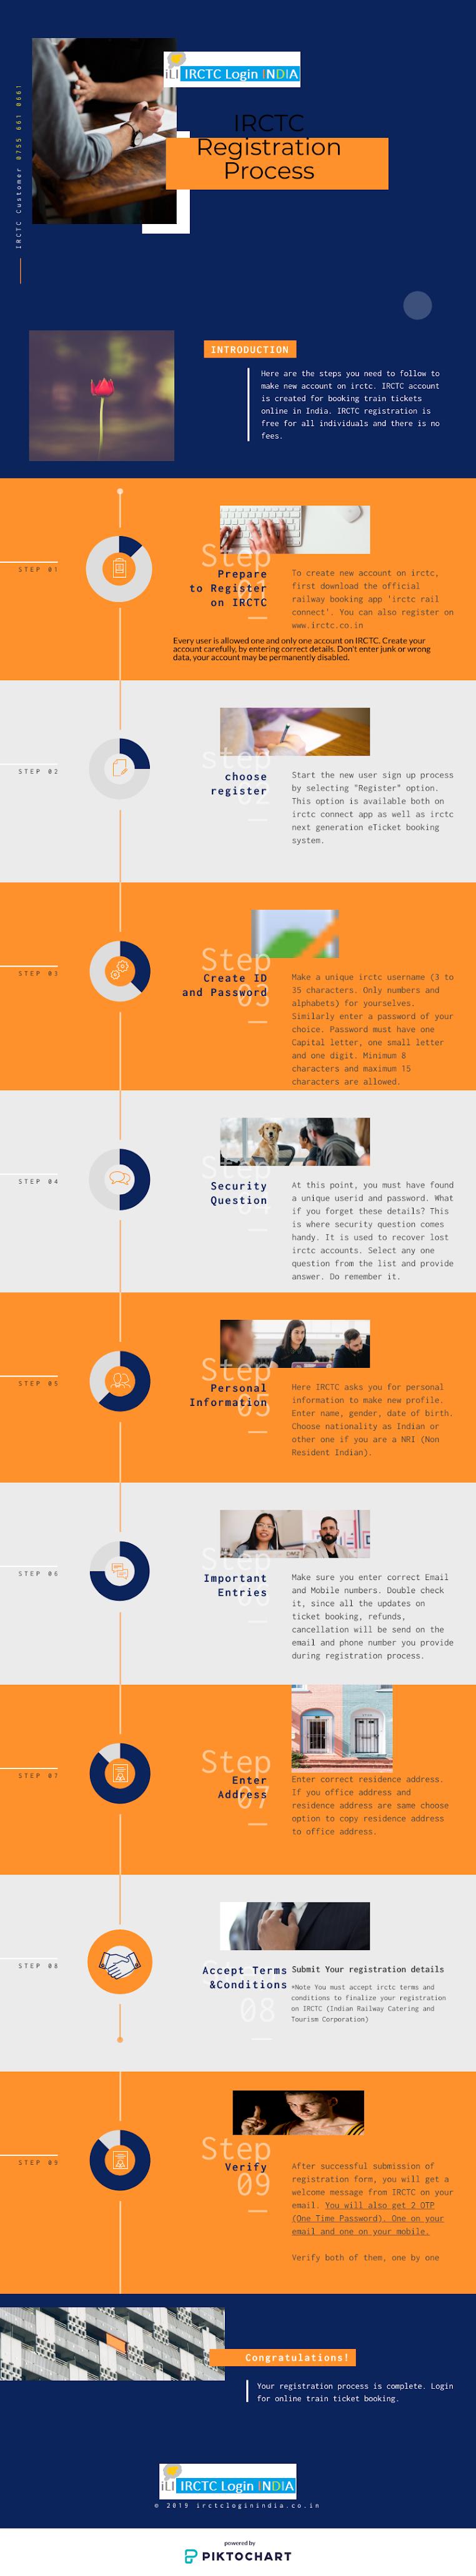 irctc registration infographic